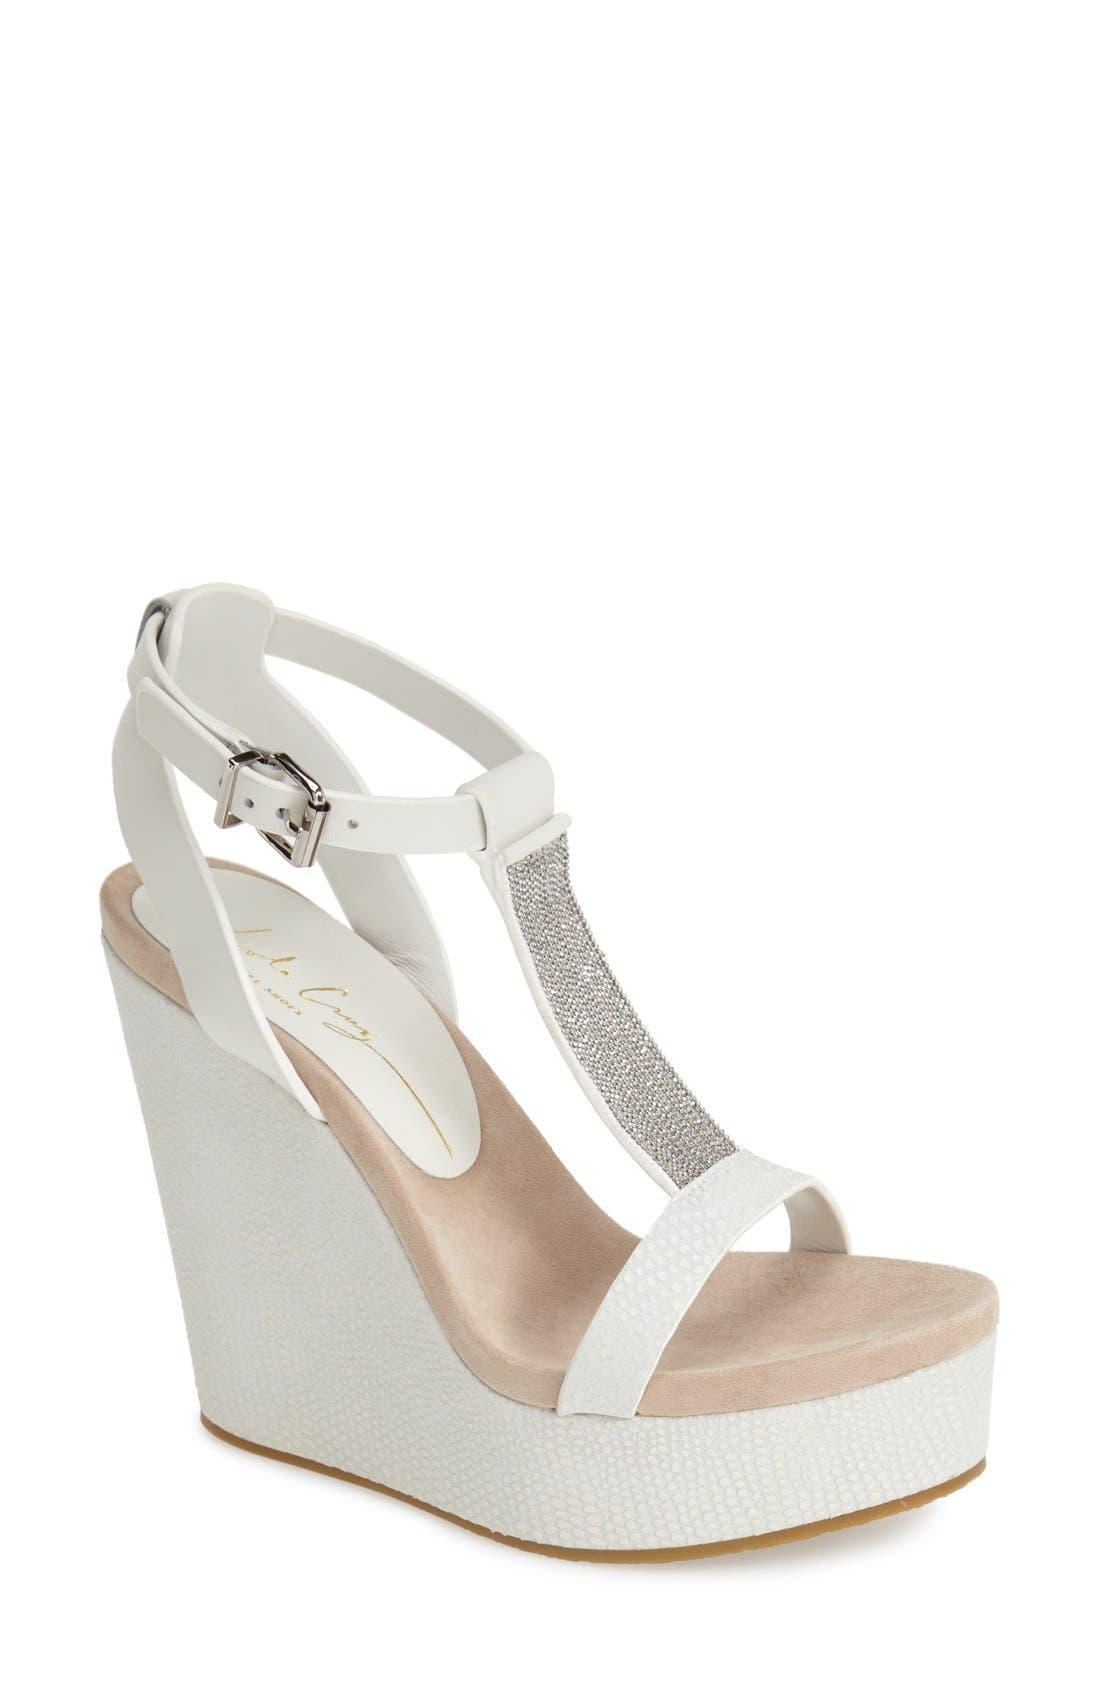 Alternate Image 1 Selected - Lola Cruz Chain T-Strap Wedge Sandal (Women)